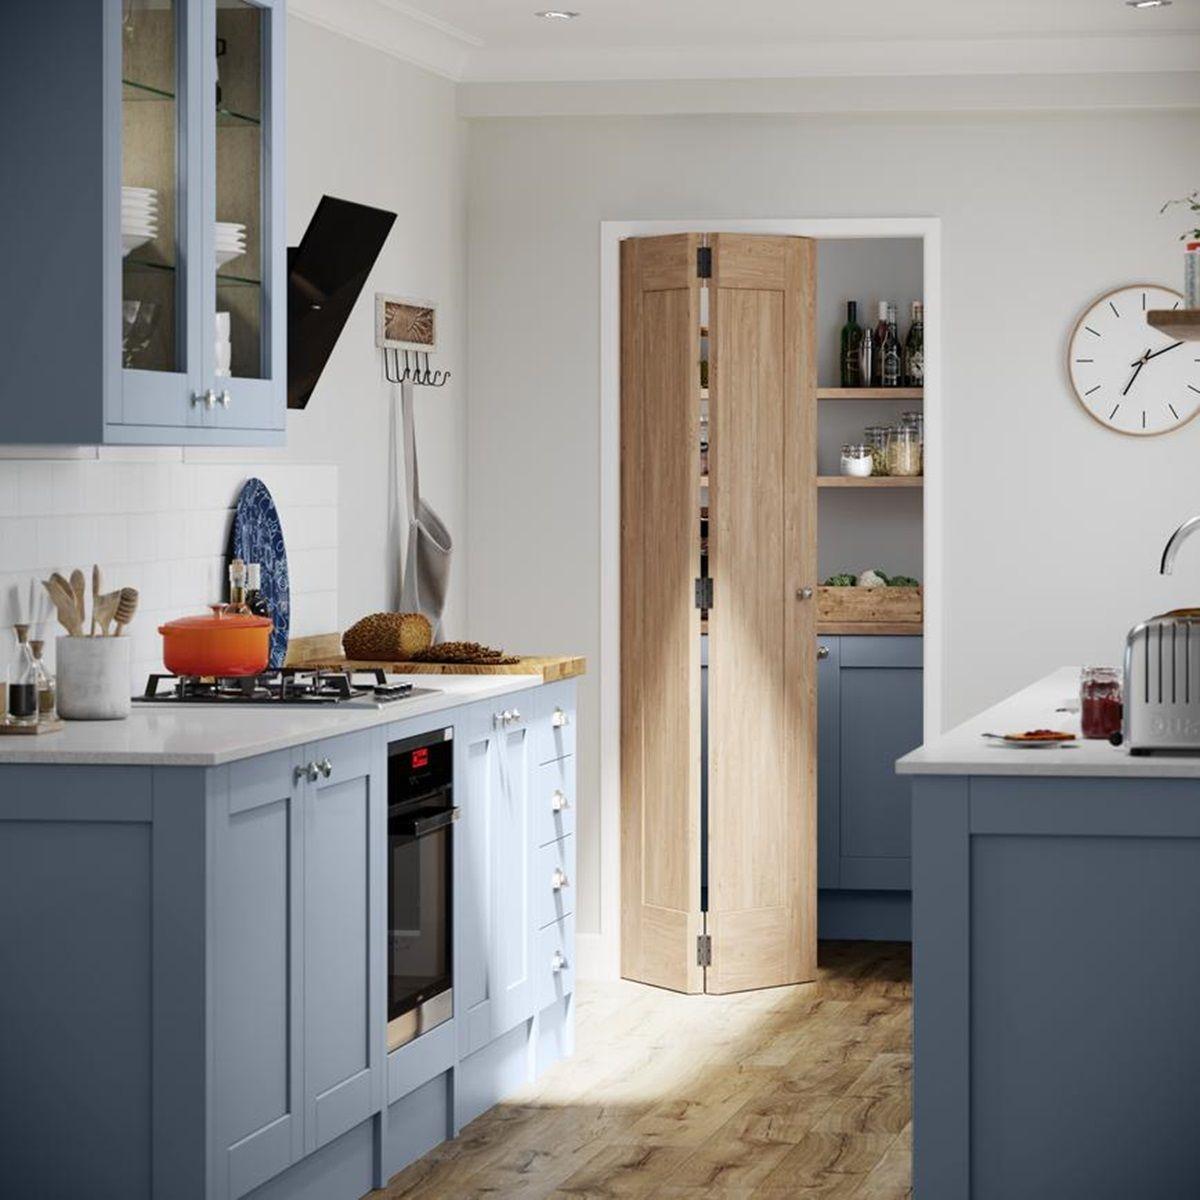 Kitchen Design Howdens: Fitted Bathroom